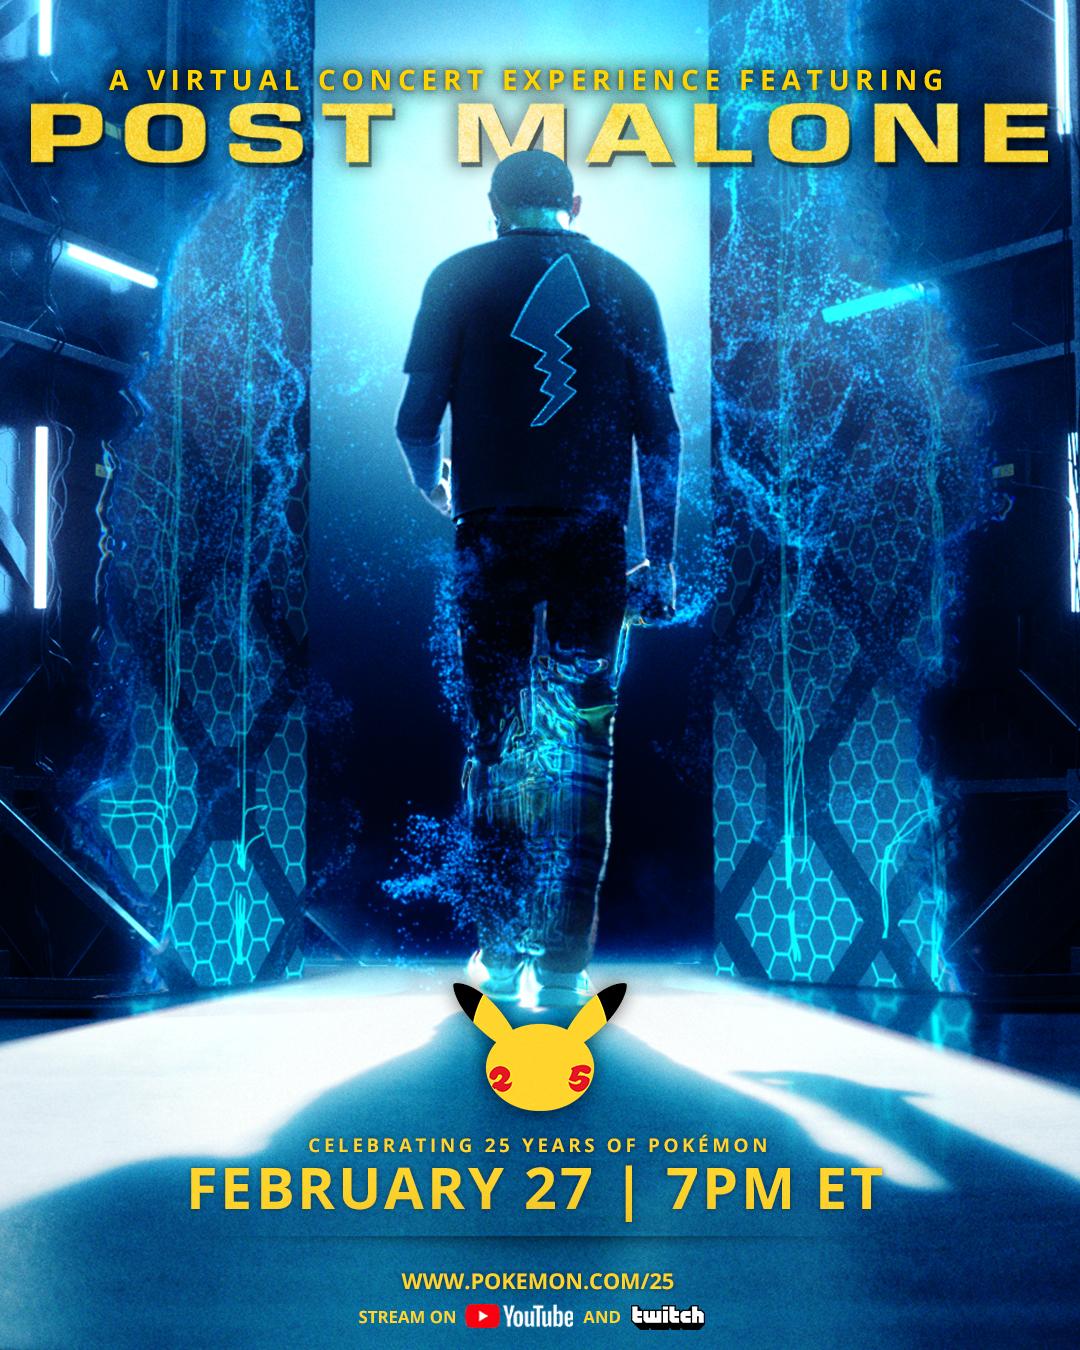 Post_Malone_x_Pokemon_Virtual_Concert_Poster.jpg